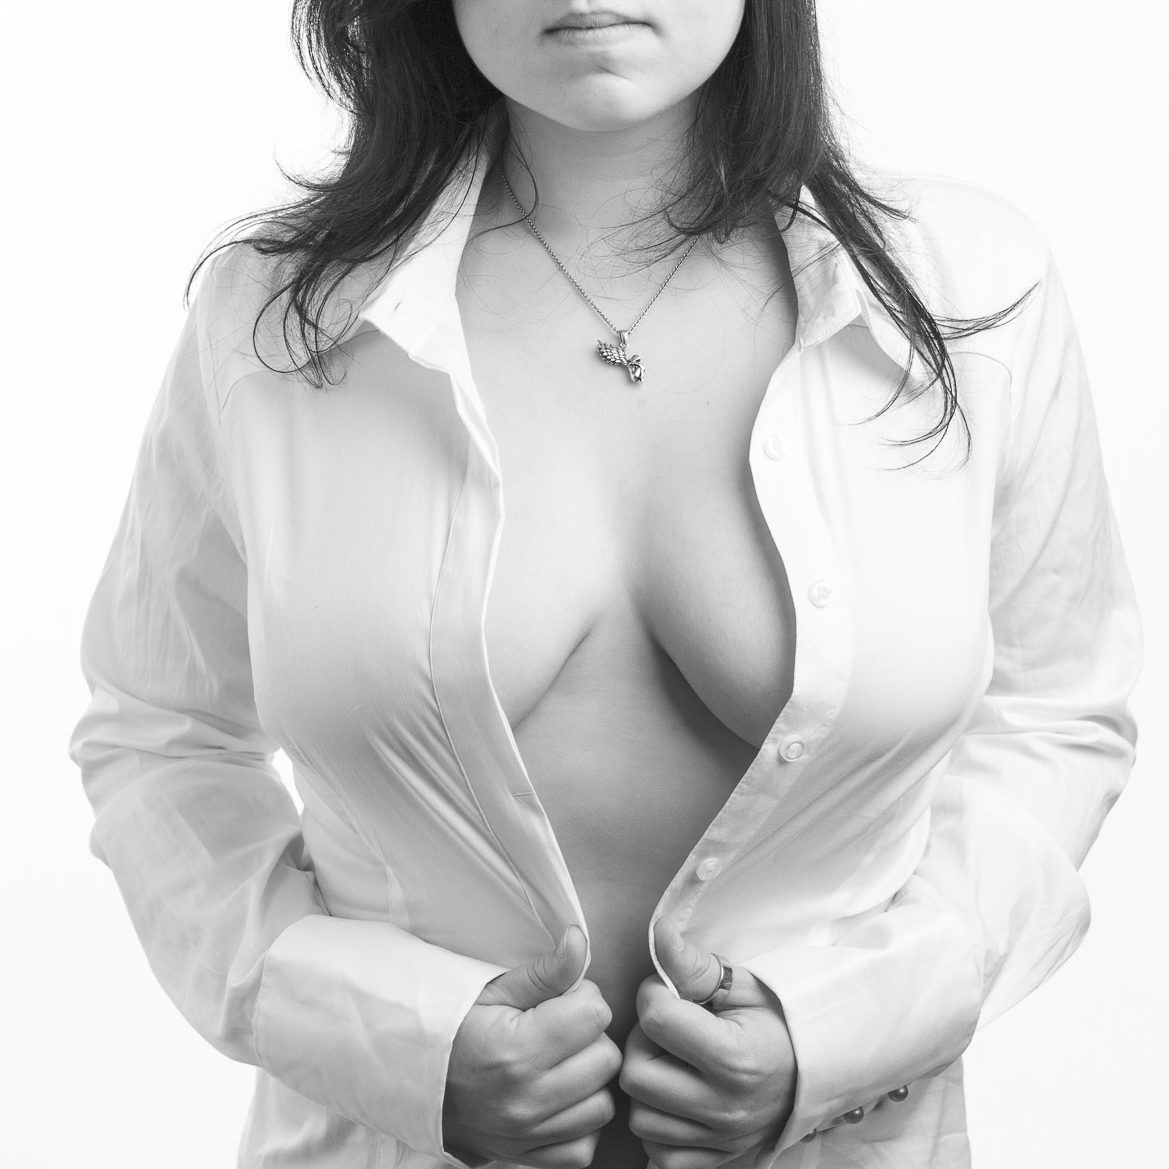 Marie S. #1